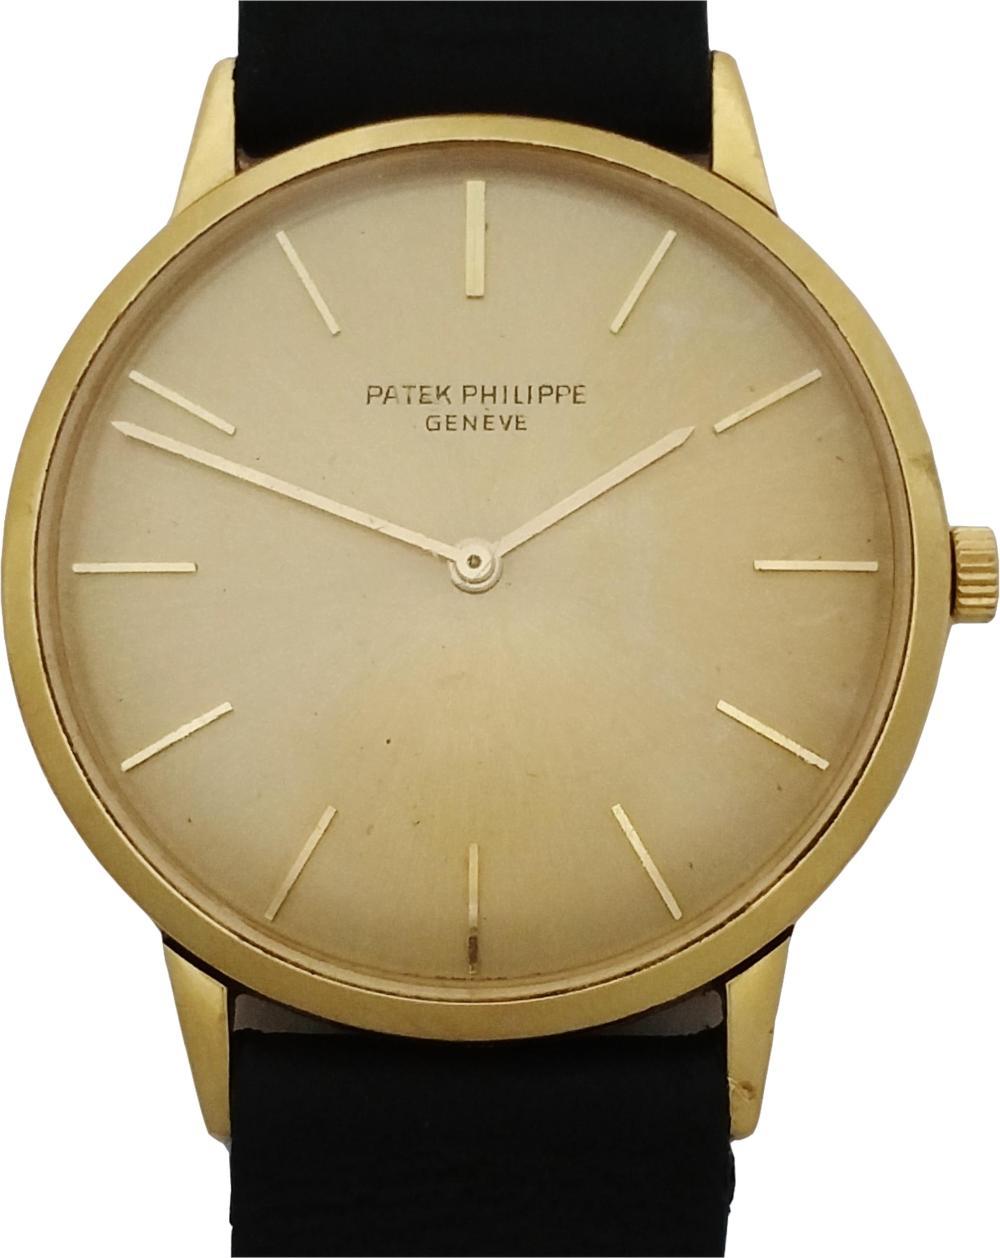 Patek Philippe Calatrava Rare Reference 3768 18k Gold Mens Vintage Watch